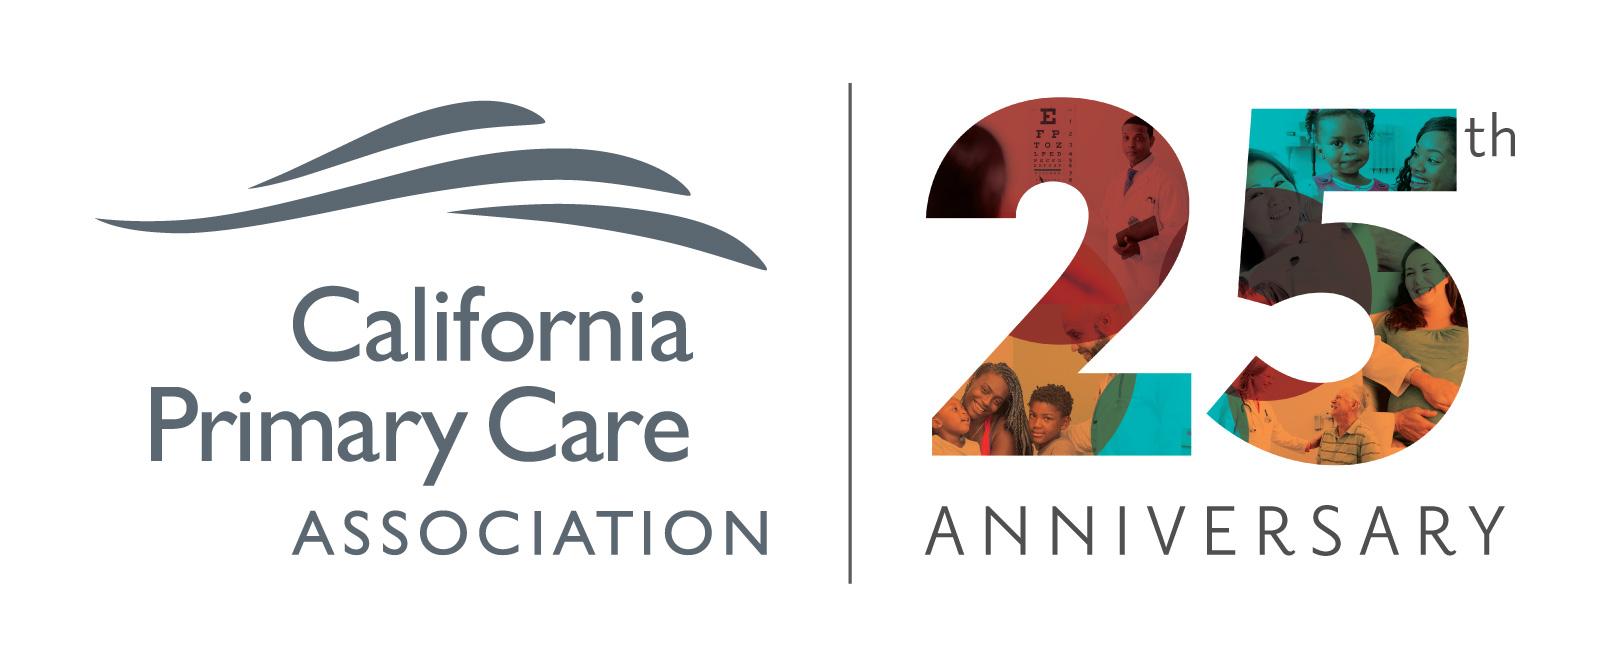 18-1236-FINAL-California-Primary-Care-Association-DESIGN-25th-Anniversary-Logo_Gray.jpg